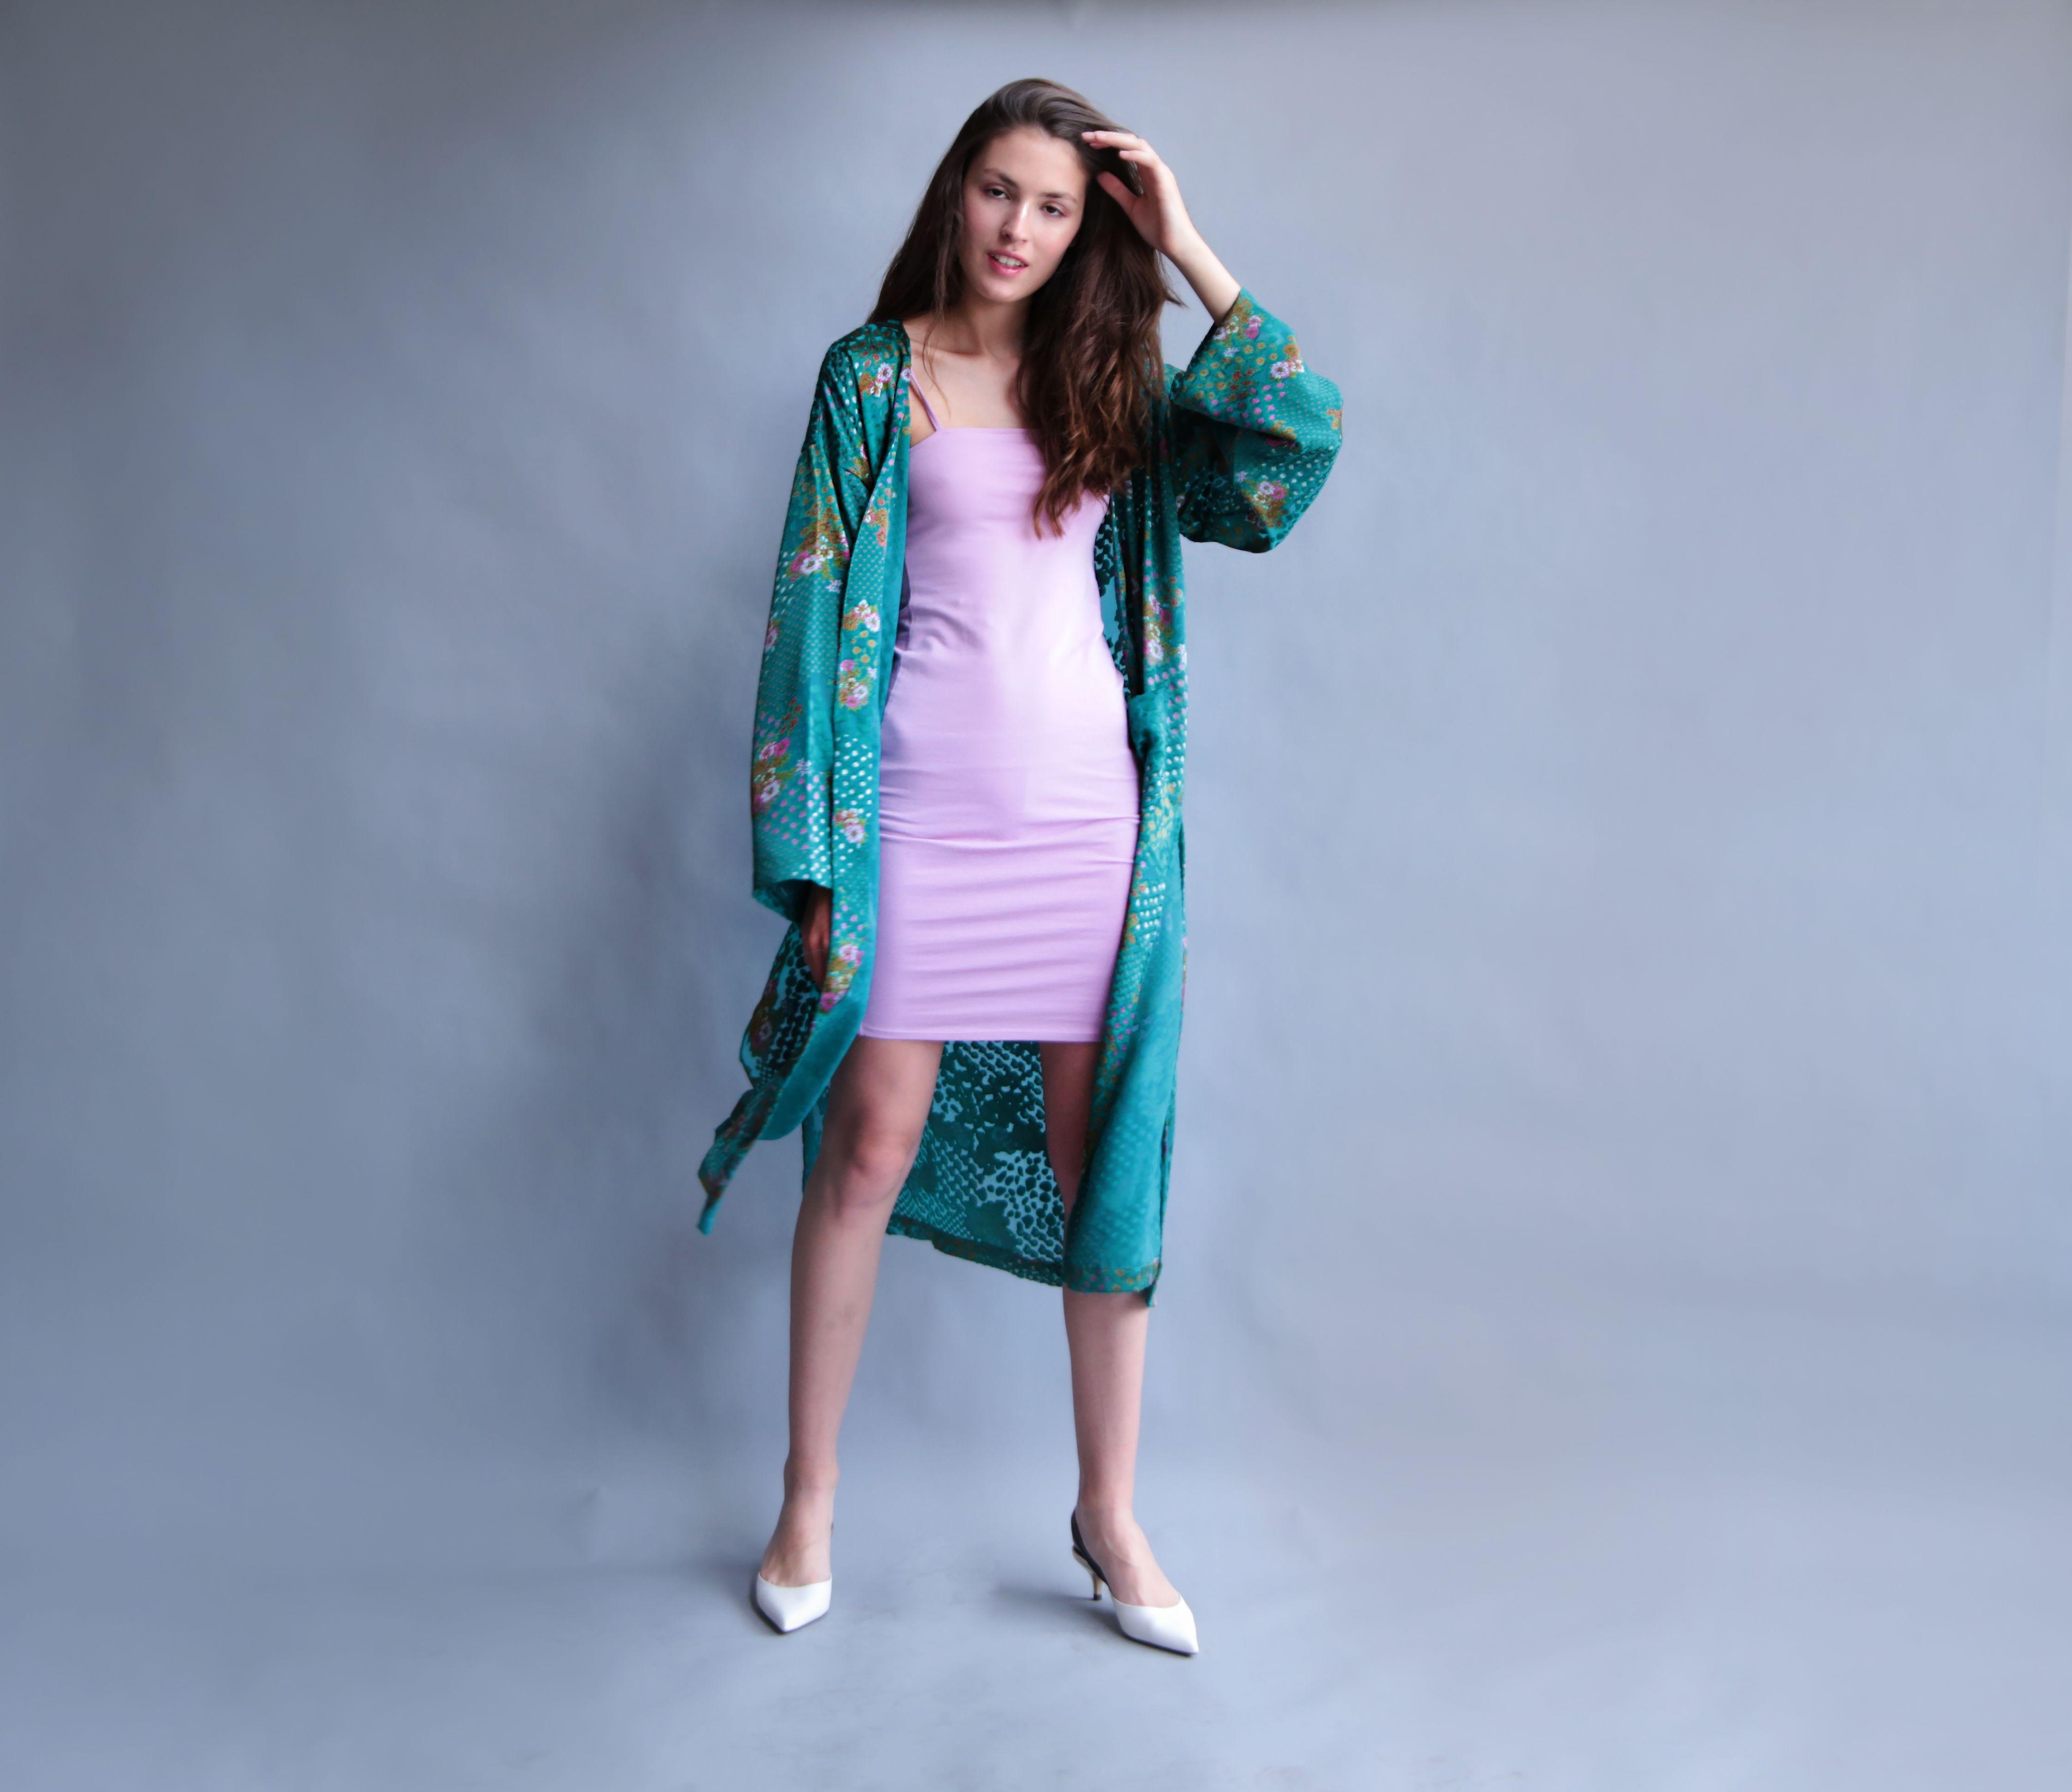 Vestido largo turquesa zapatos